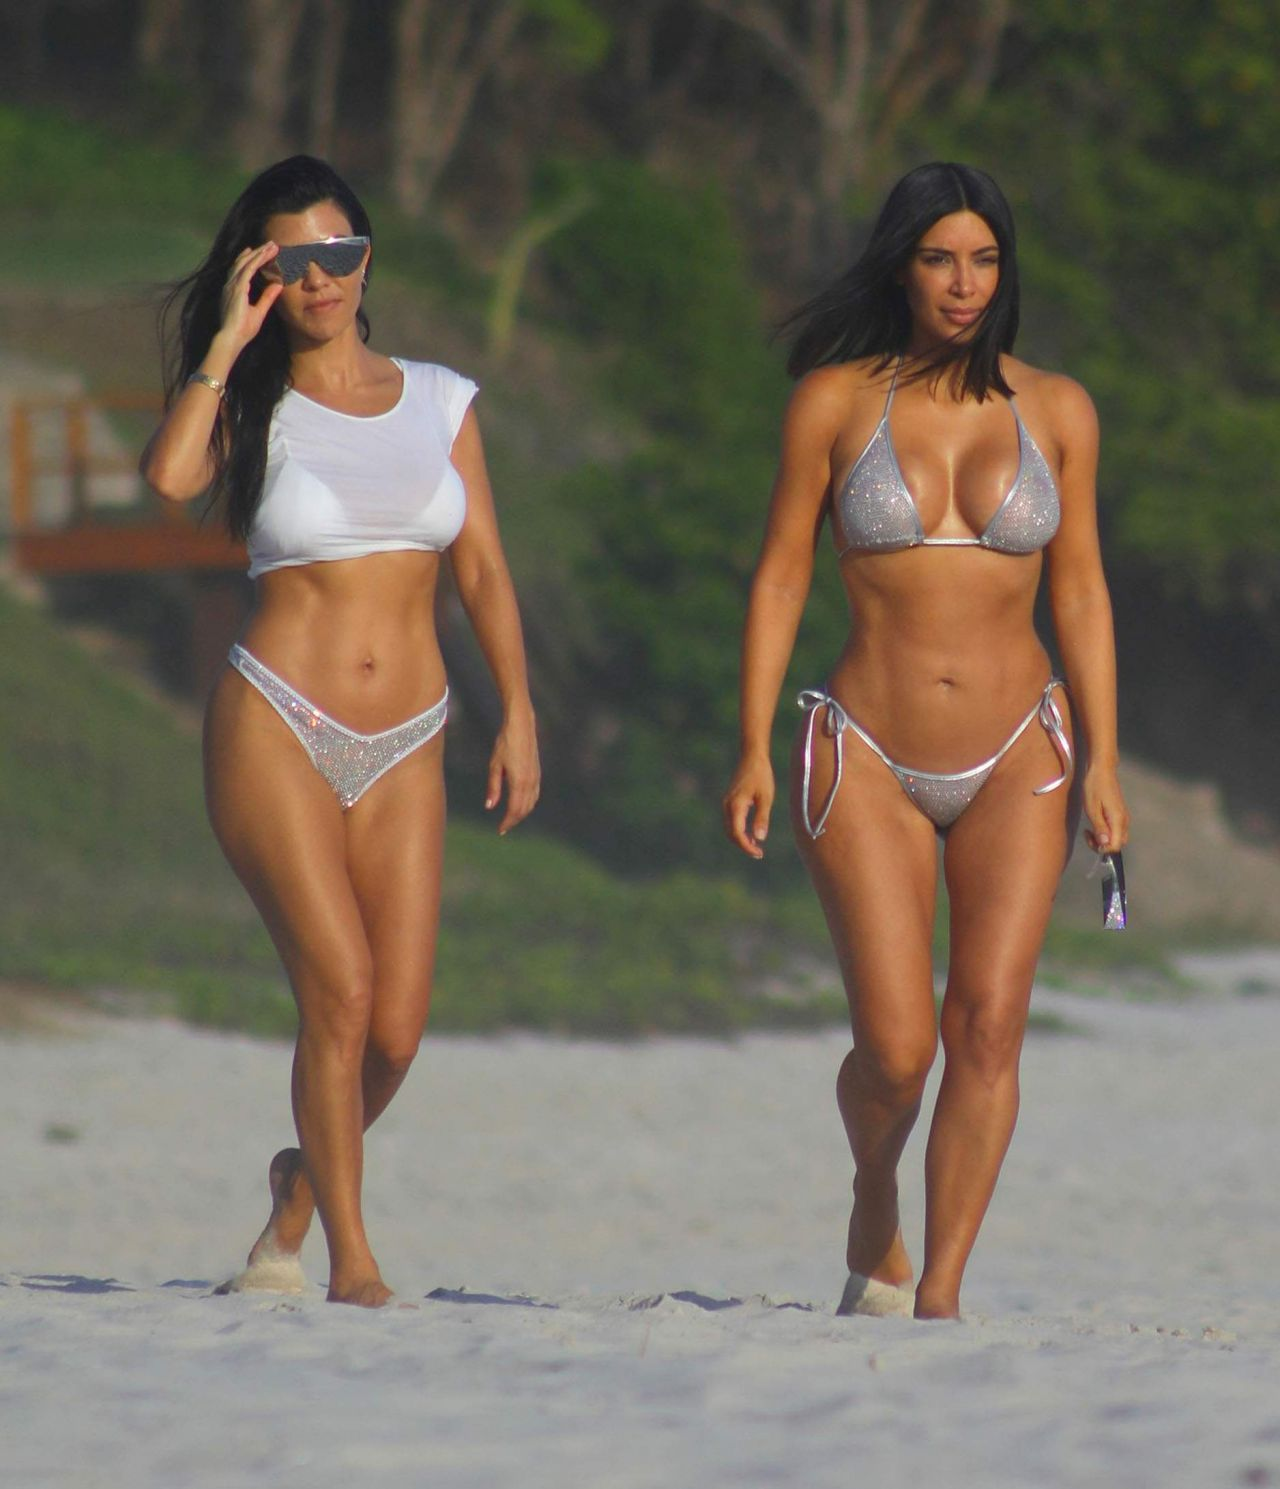 Kim and Kourtney Kardashian on the Beach in Mexico 04/26/2017